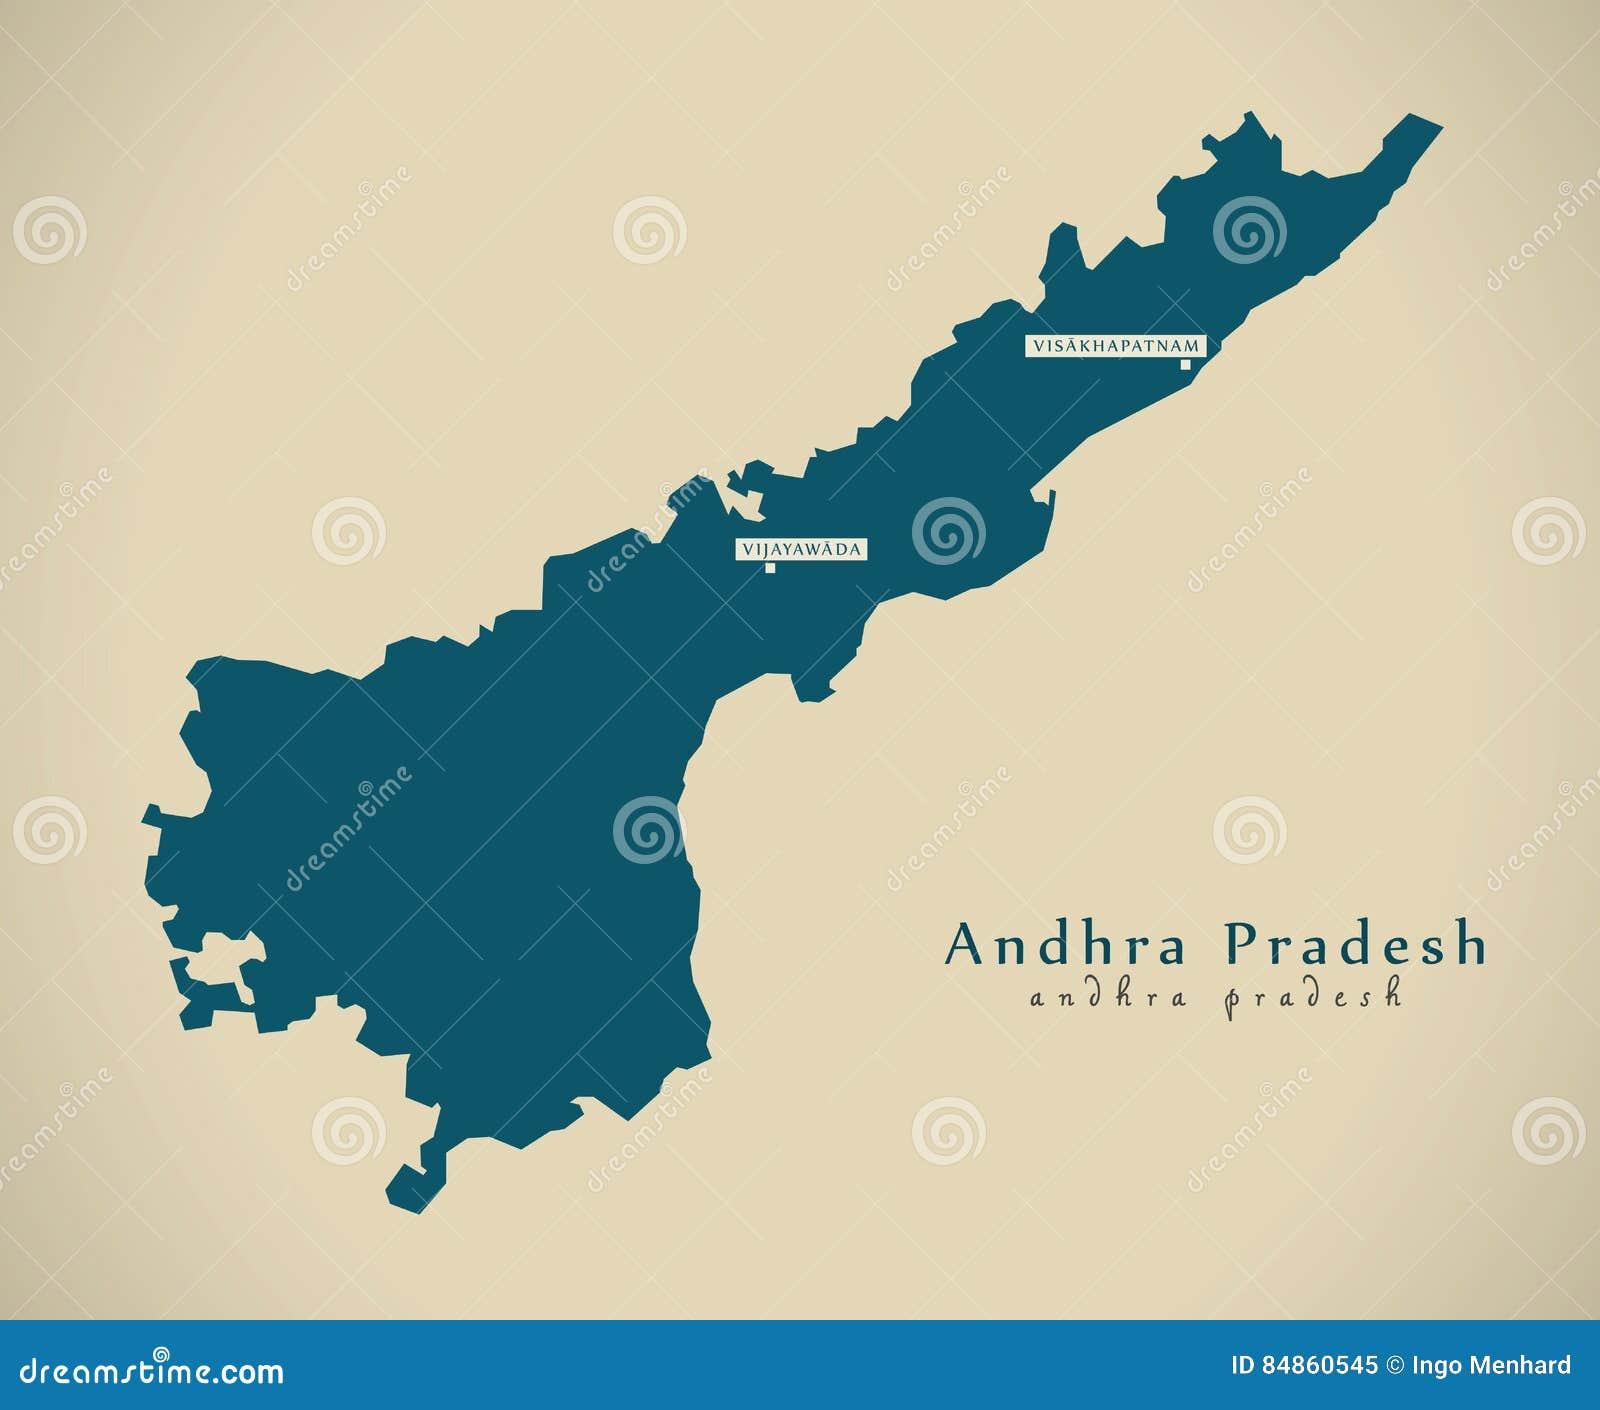 Modern Map - Andhra Pradesh IN India Federal State Illustration ...